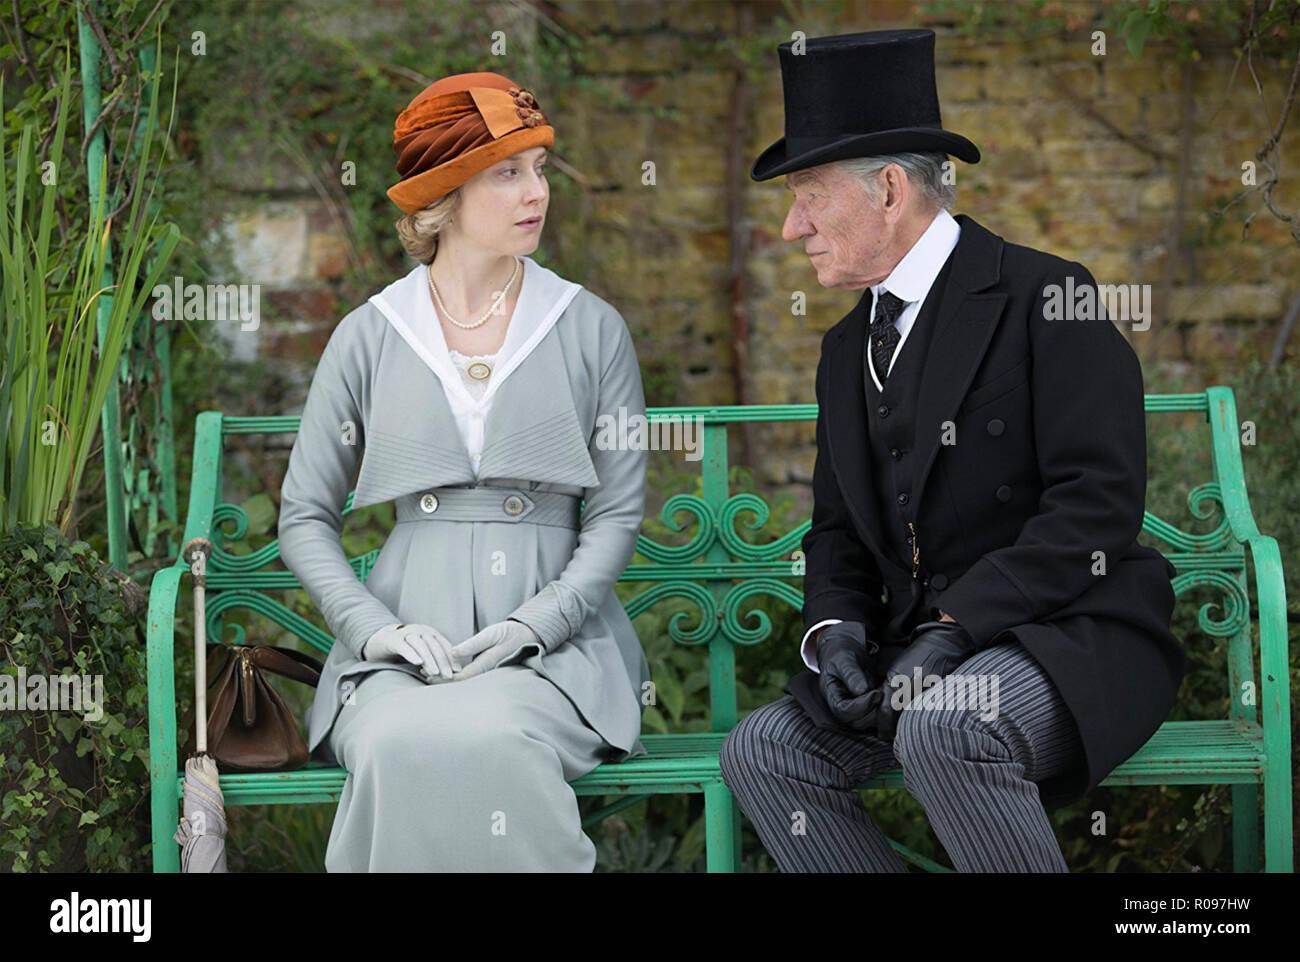 MR. HOLMES 2015 Miramax film with Ian McKellen and Hattie Morahan - Stock Image